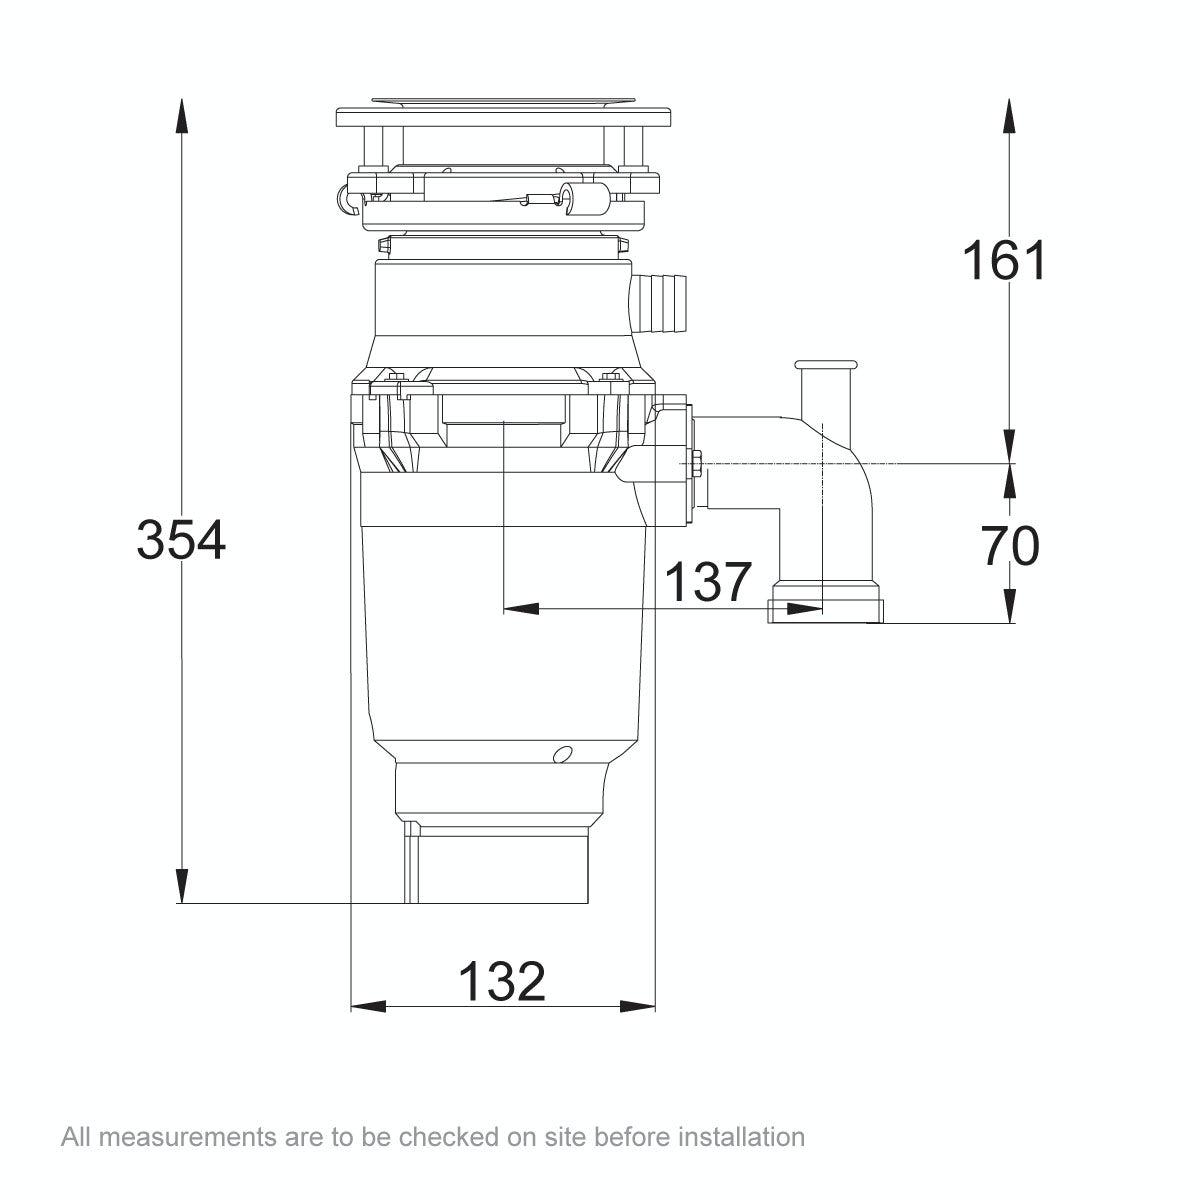 Dimensions for Bone Crusher Builder 500 kitchen sink waste disposal unit